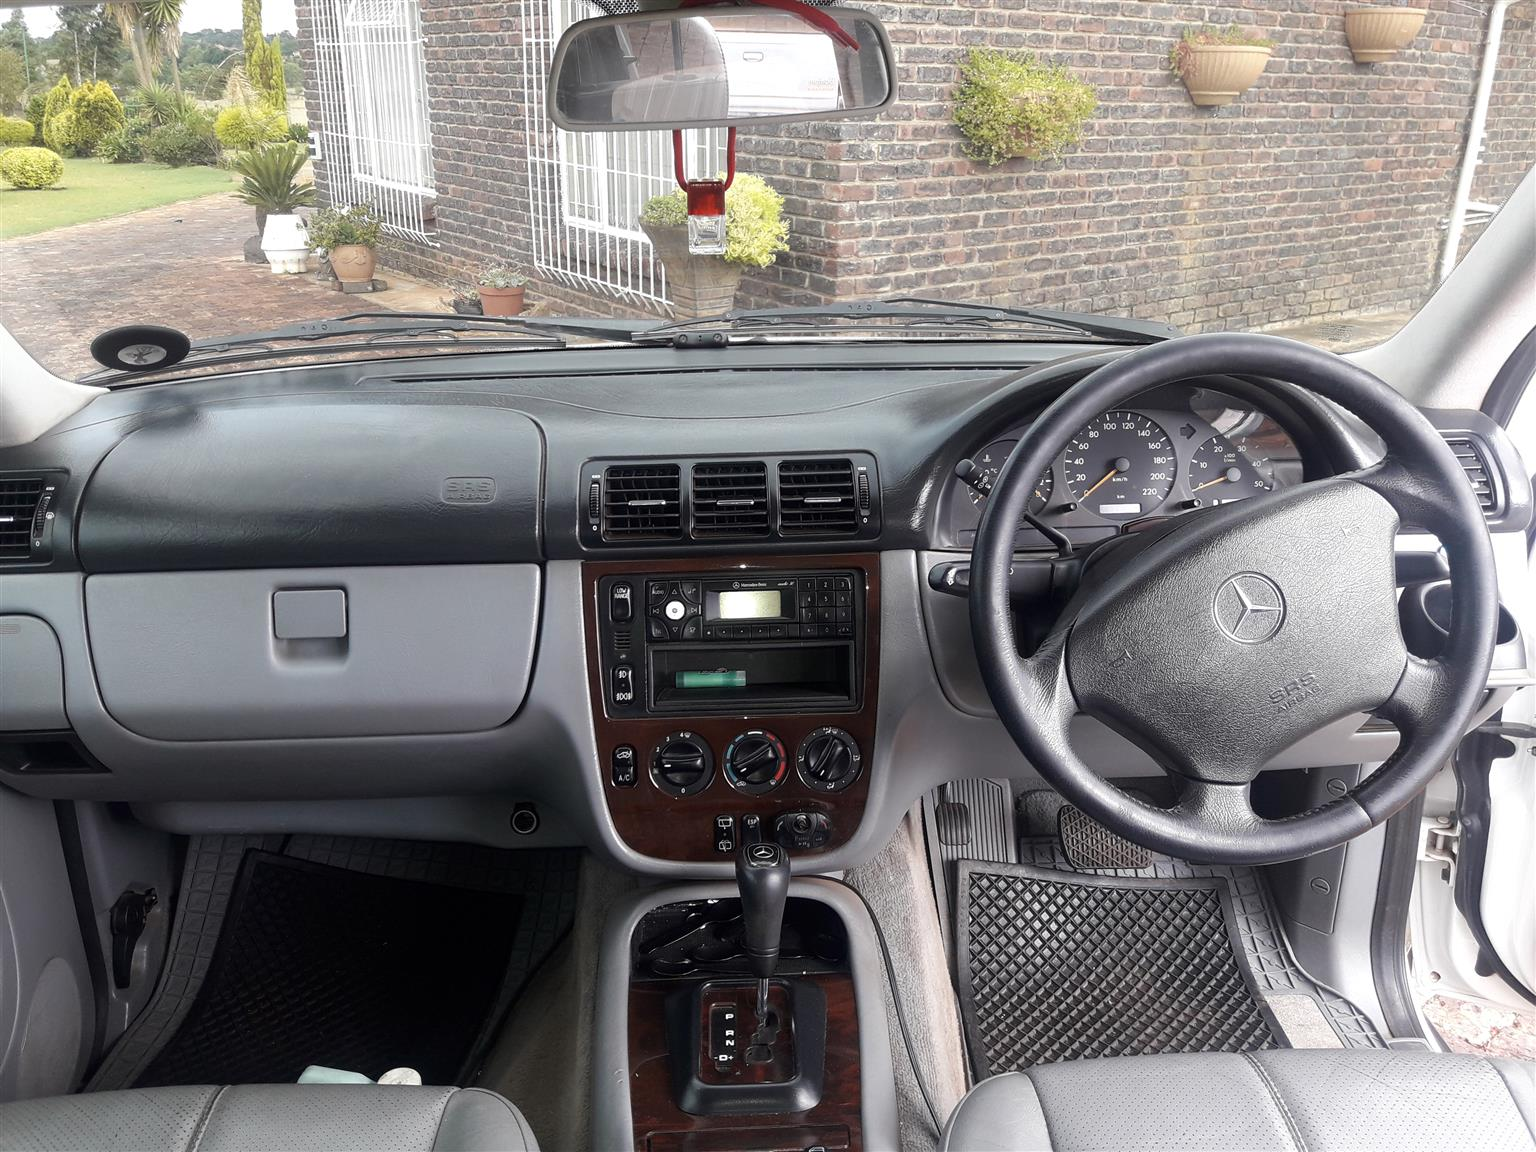 2001 Mercedes Benz ML 270CDI